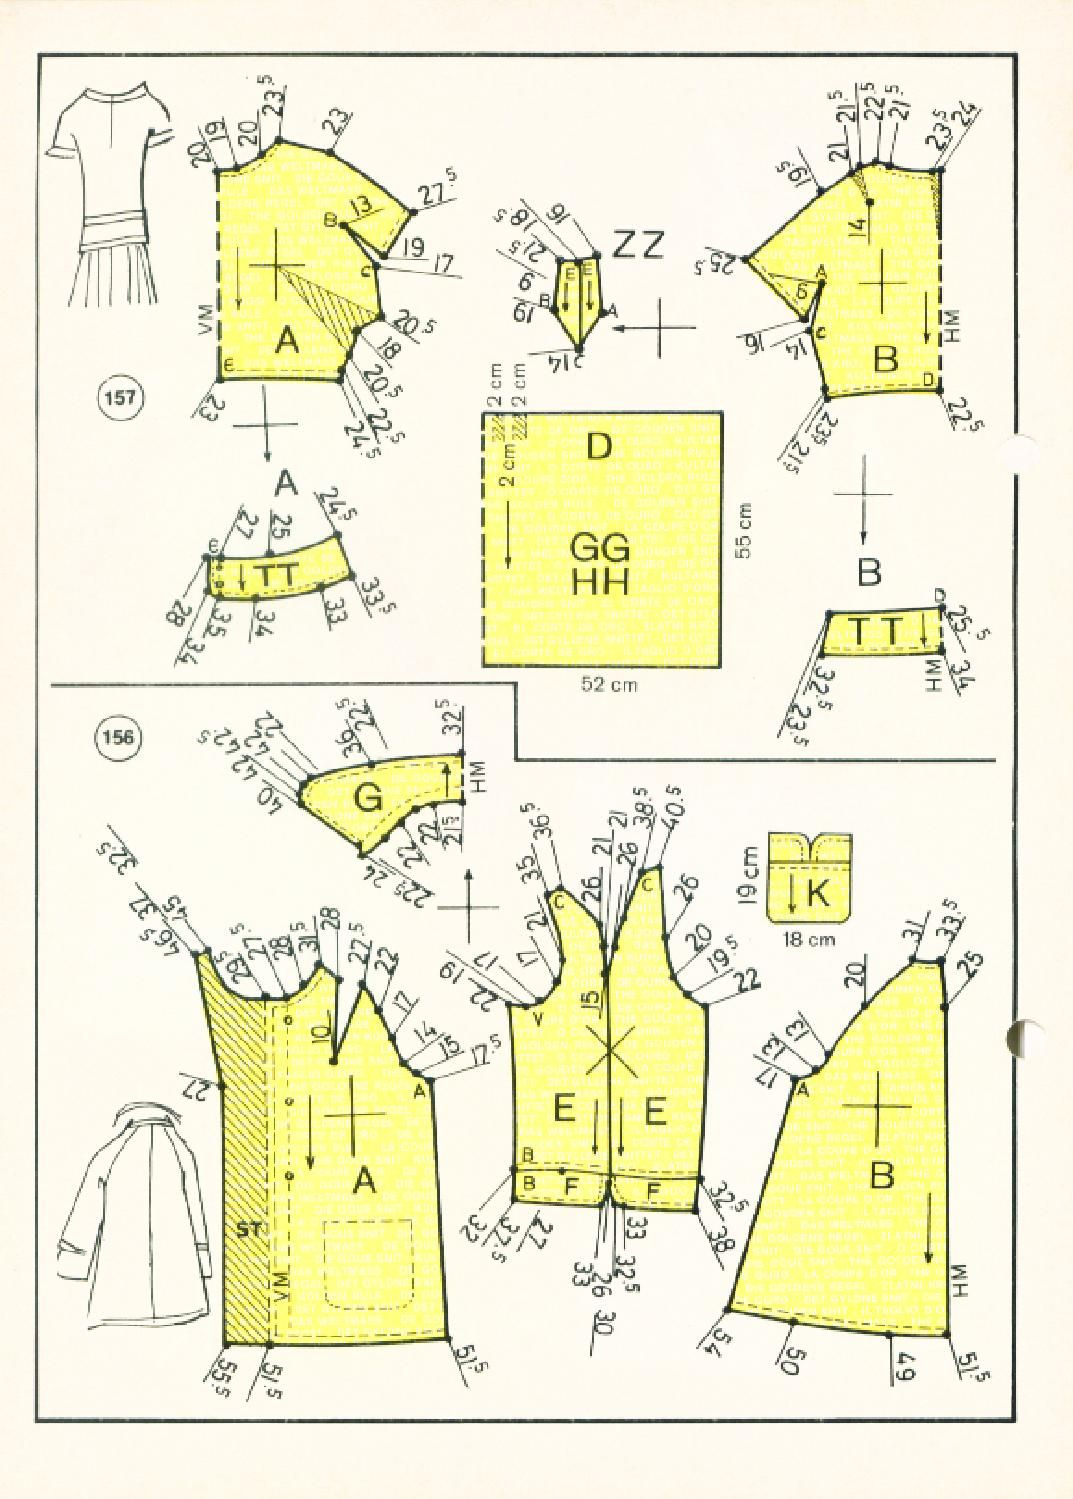 Vintage Sewing Patterns 127 winter 1972 Patternmaking | corte de oro ...